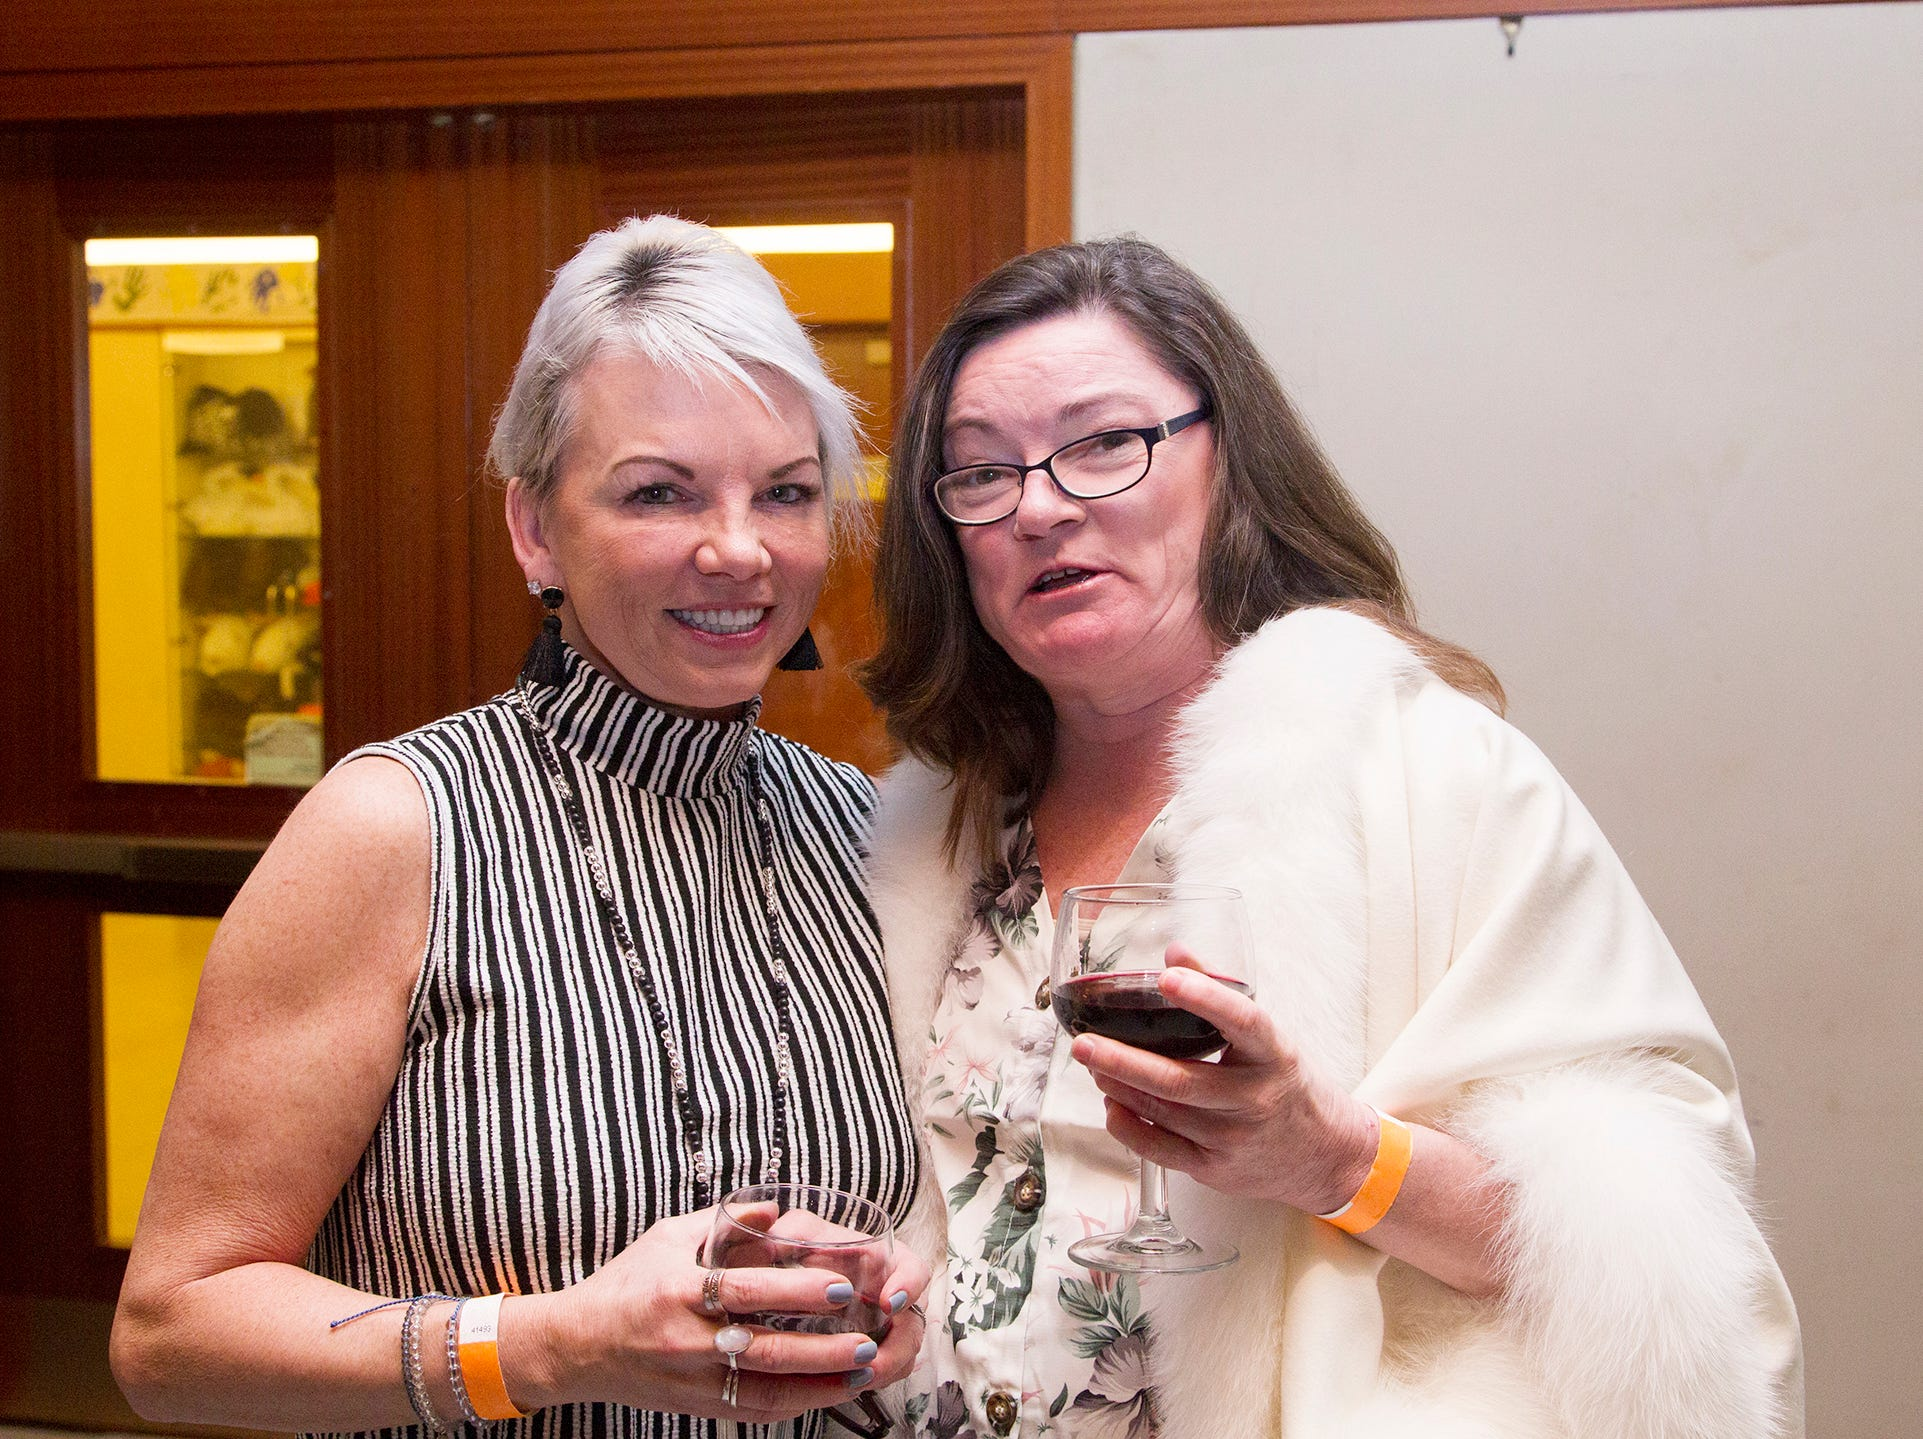 JoAnn Romano, Cynthia Orlowski. Anthony Kearns benefit concert to benefit Julia's Butterfly Foundation at West Side Presbyterian Church in Ridgewood. 3/23/2019